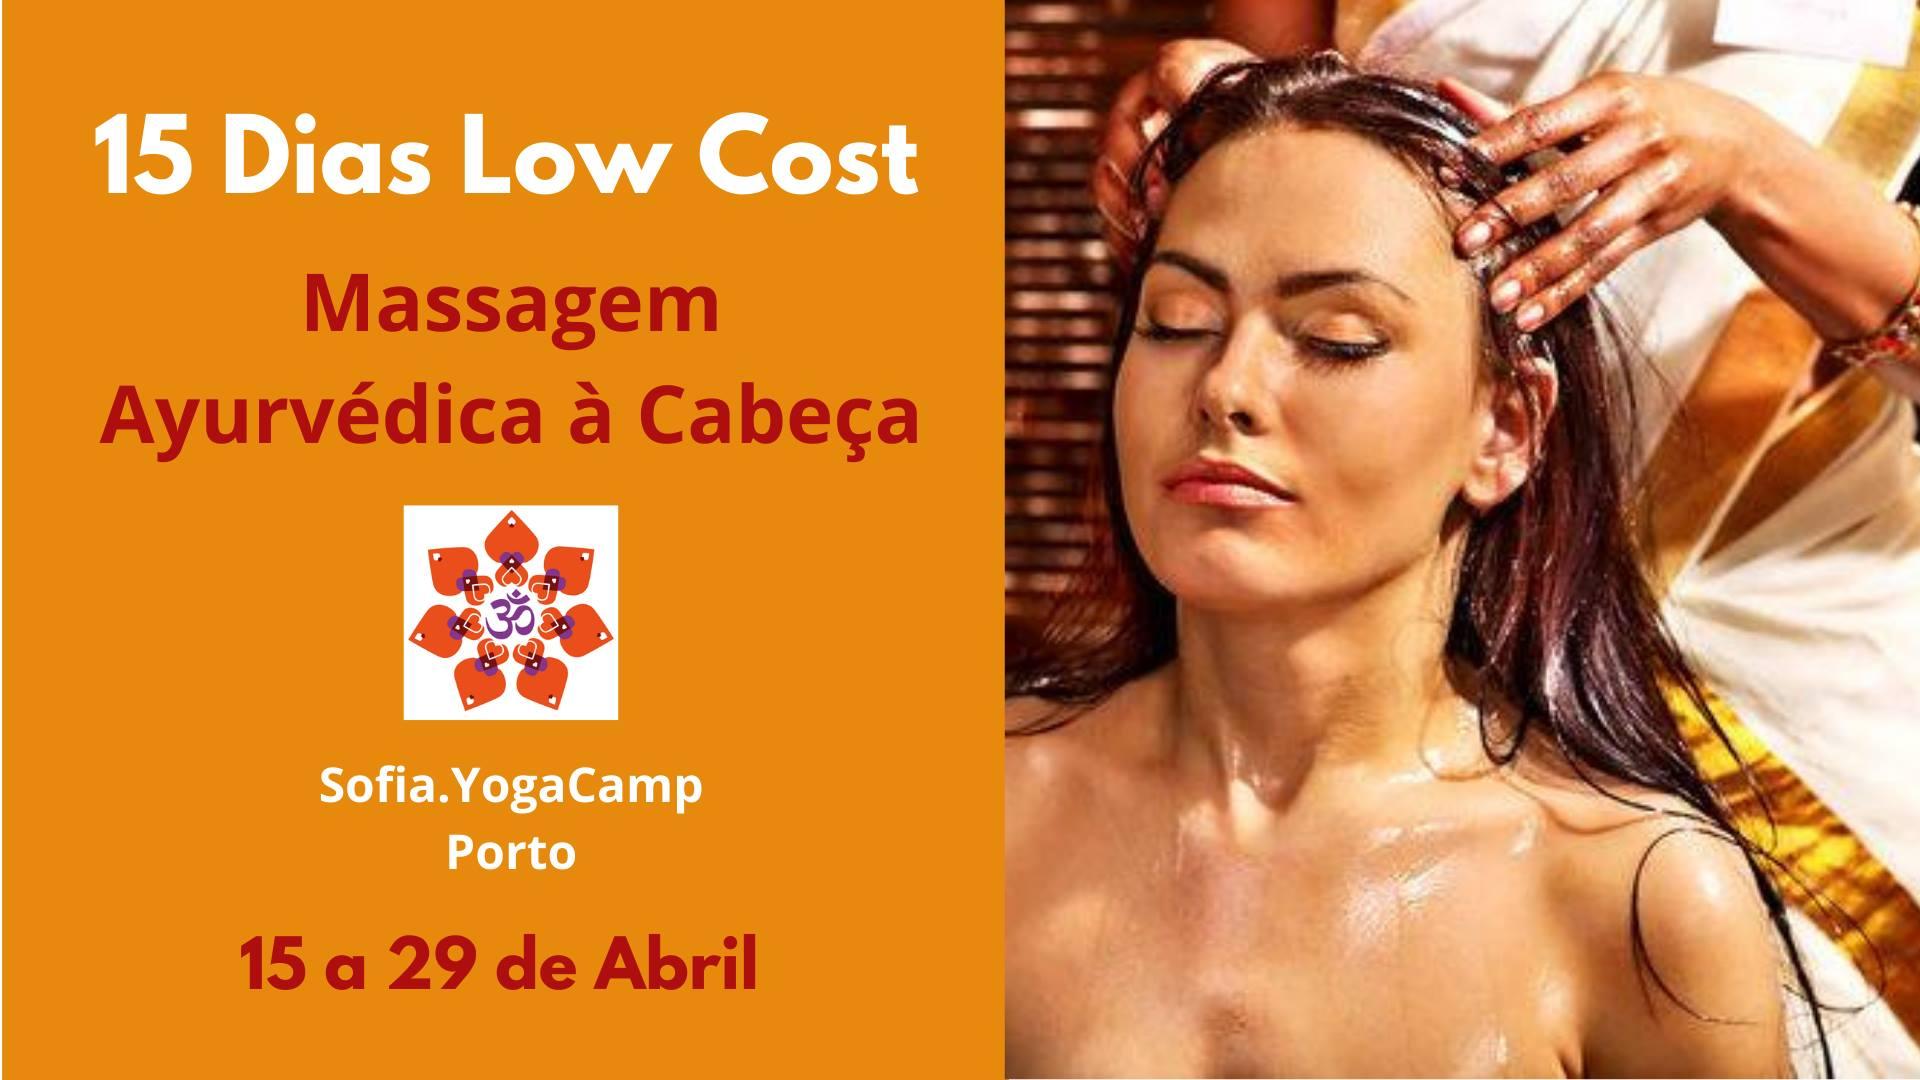 15 Dias Low Cost- Massagem Ayurvédica à Cabeça